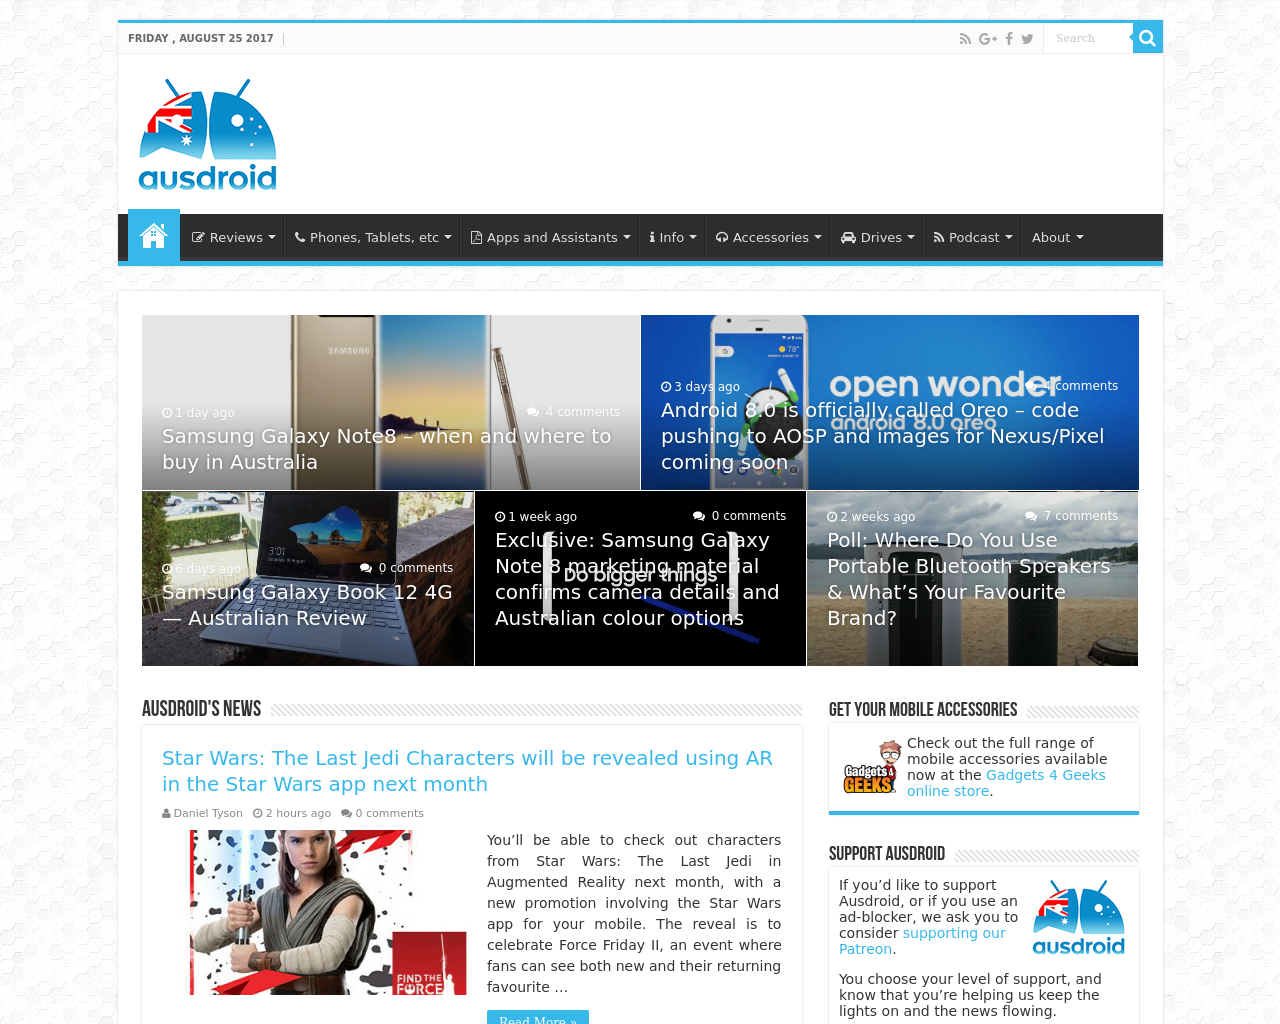 Ausdroid-Advertising-Reviews-Pricing